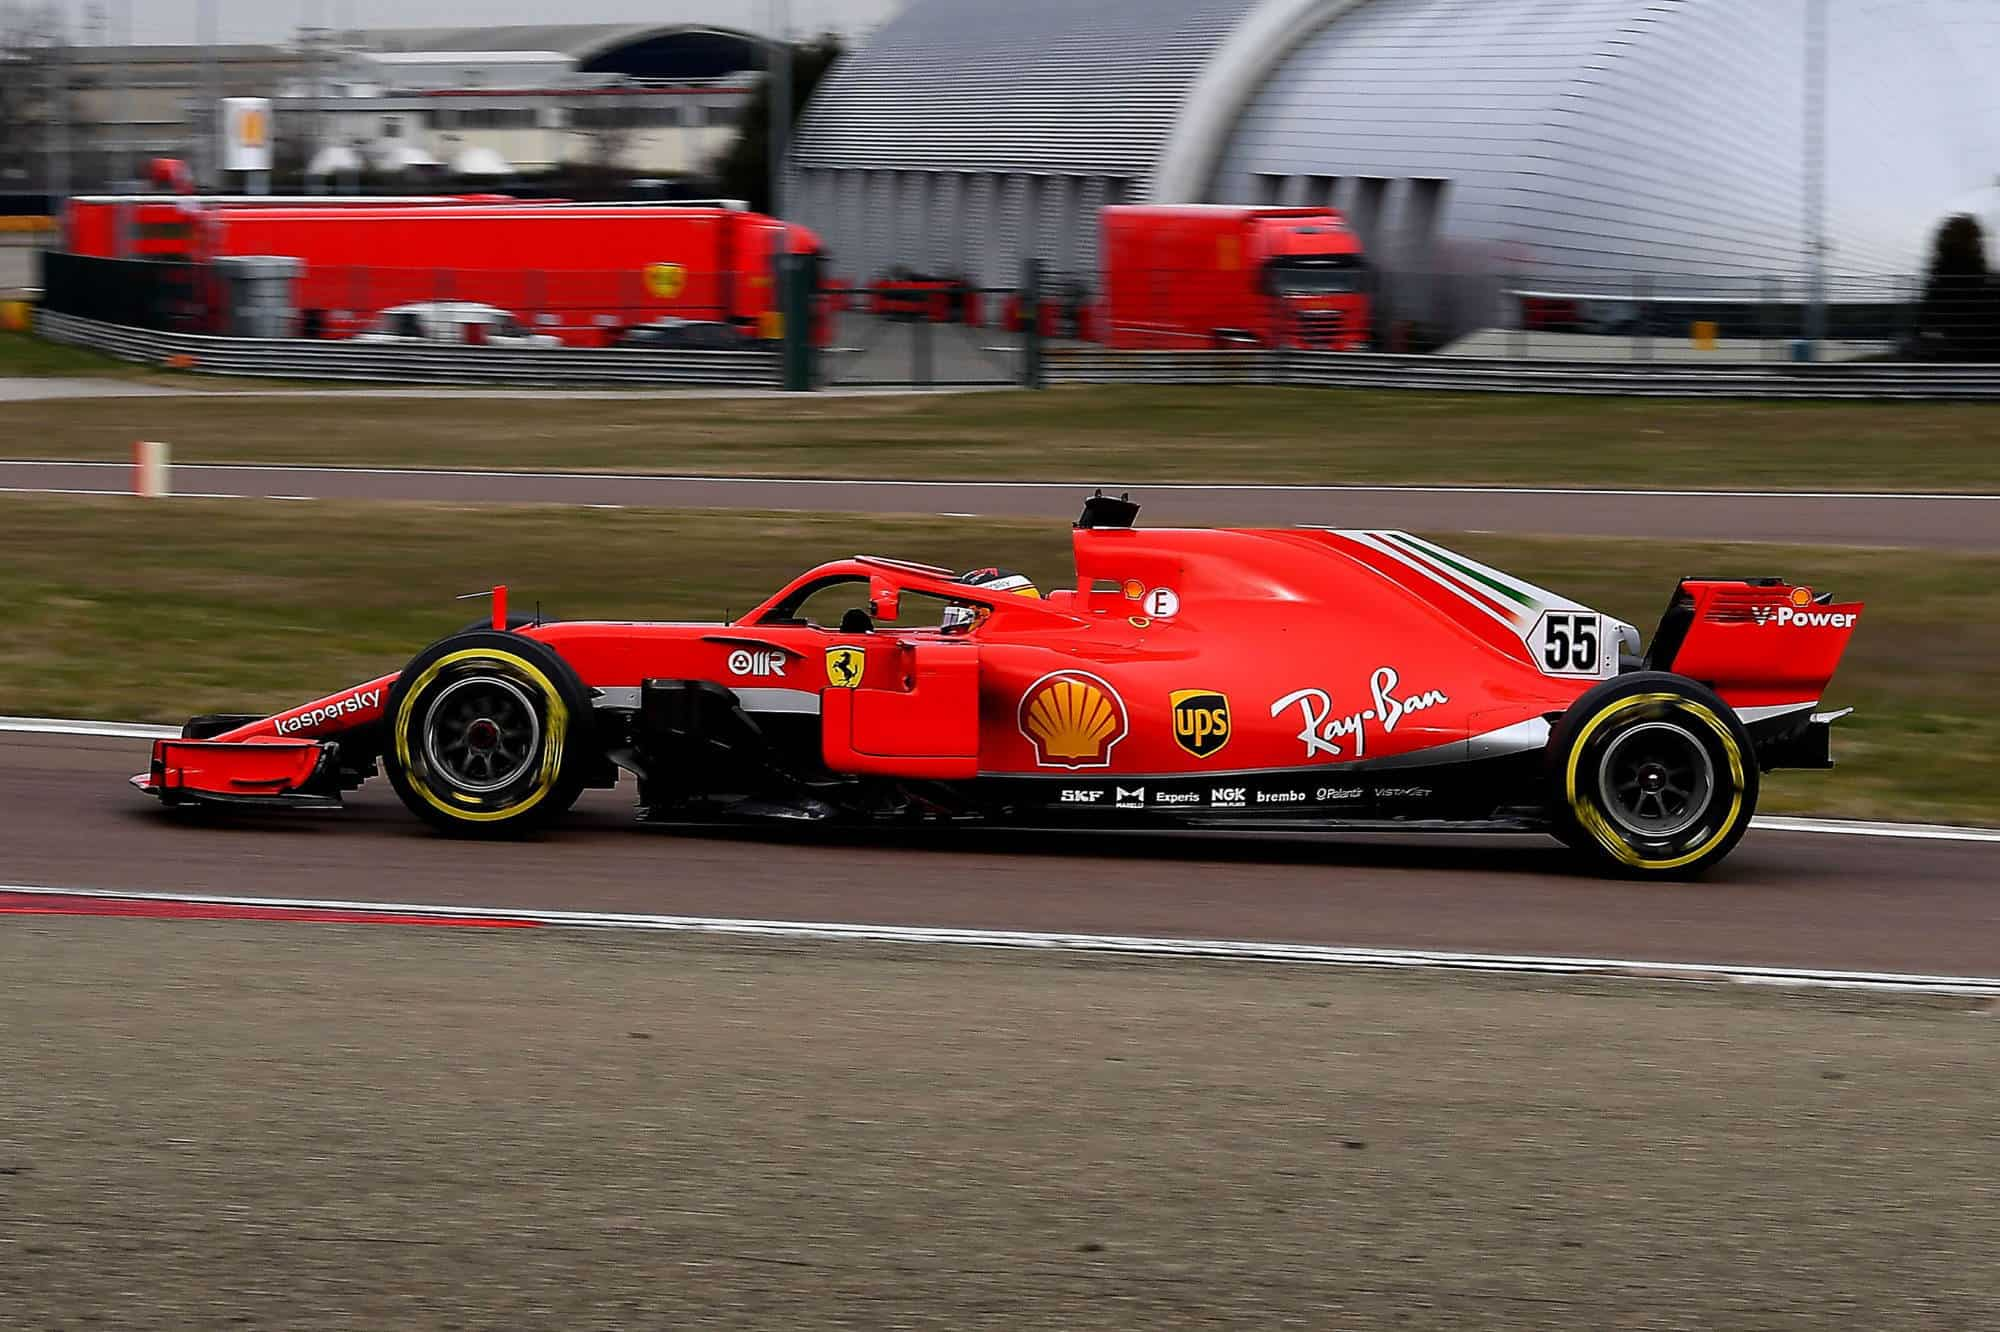 2021 Fiorano Carlos Sainz first Ferrari test on track side Fiorano Ferrari SF71H 2018 on Wed 27 Jan 2021 Photo Ferrari